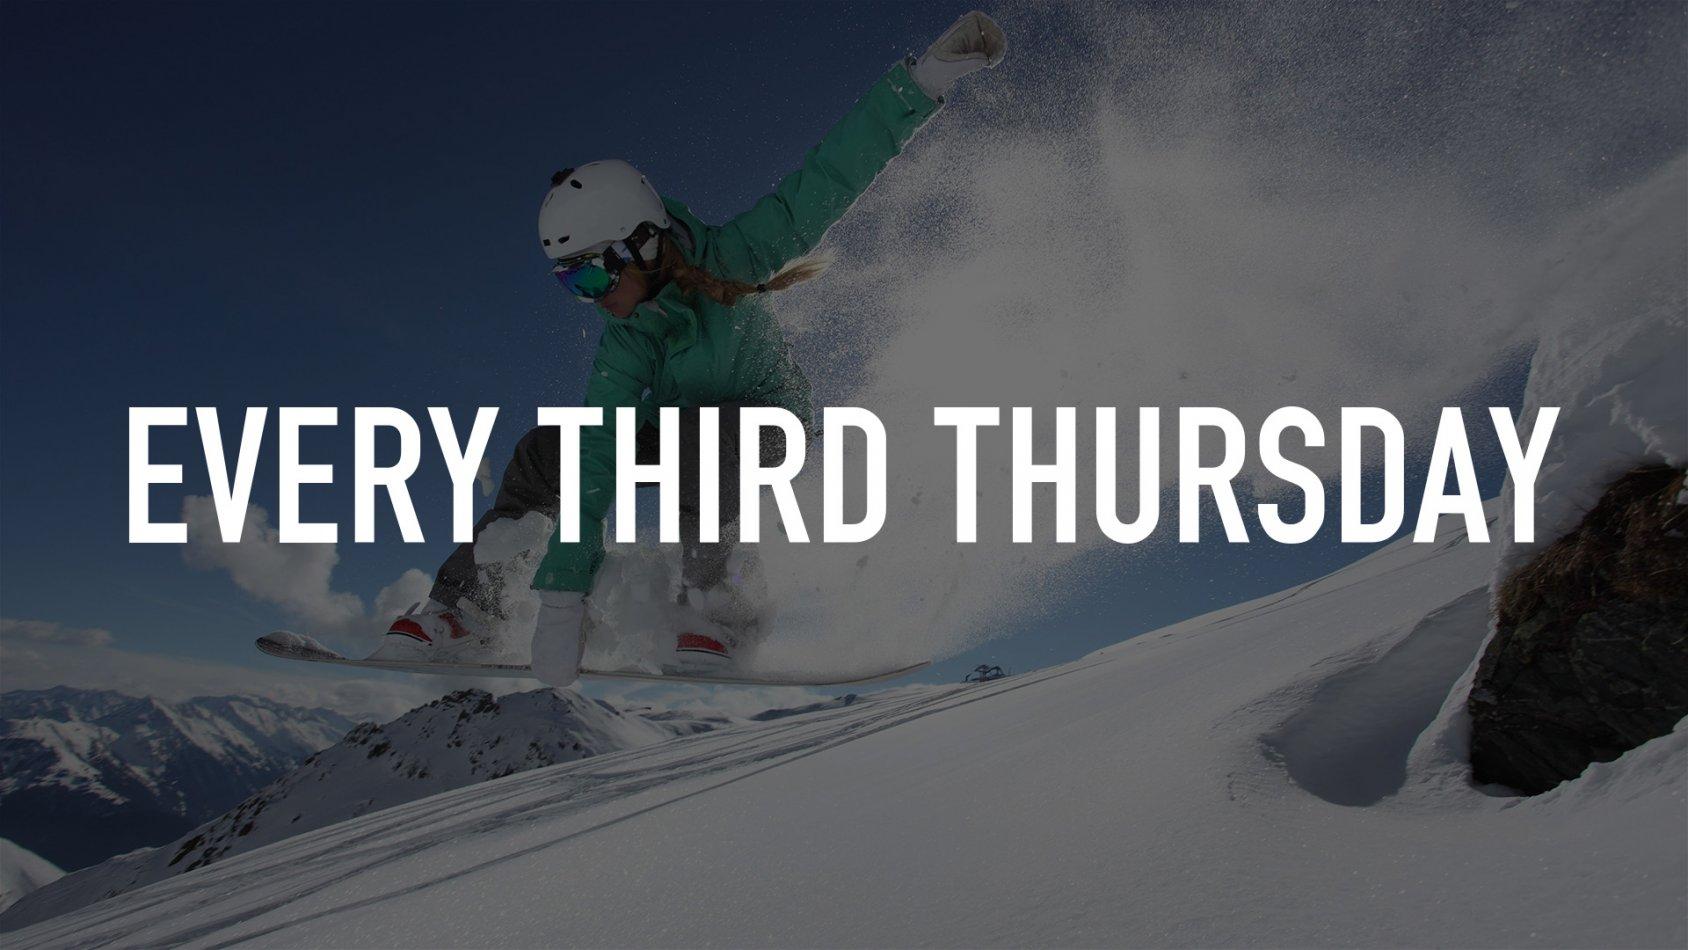 Every Third Thursday